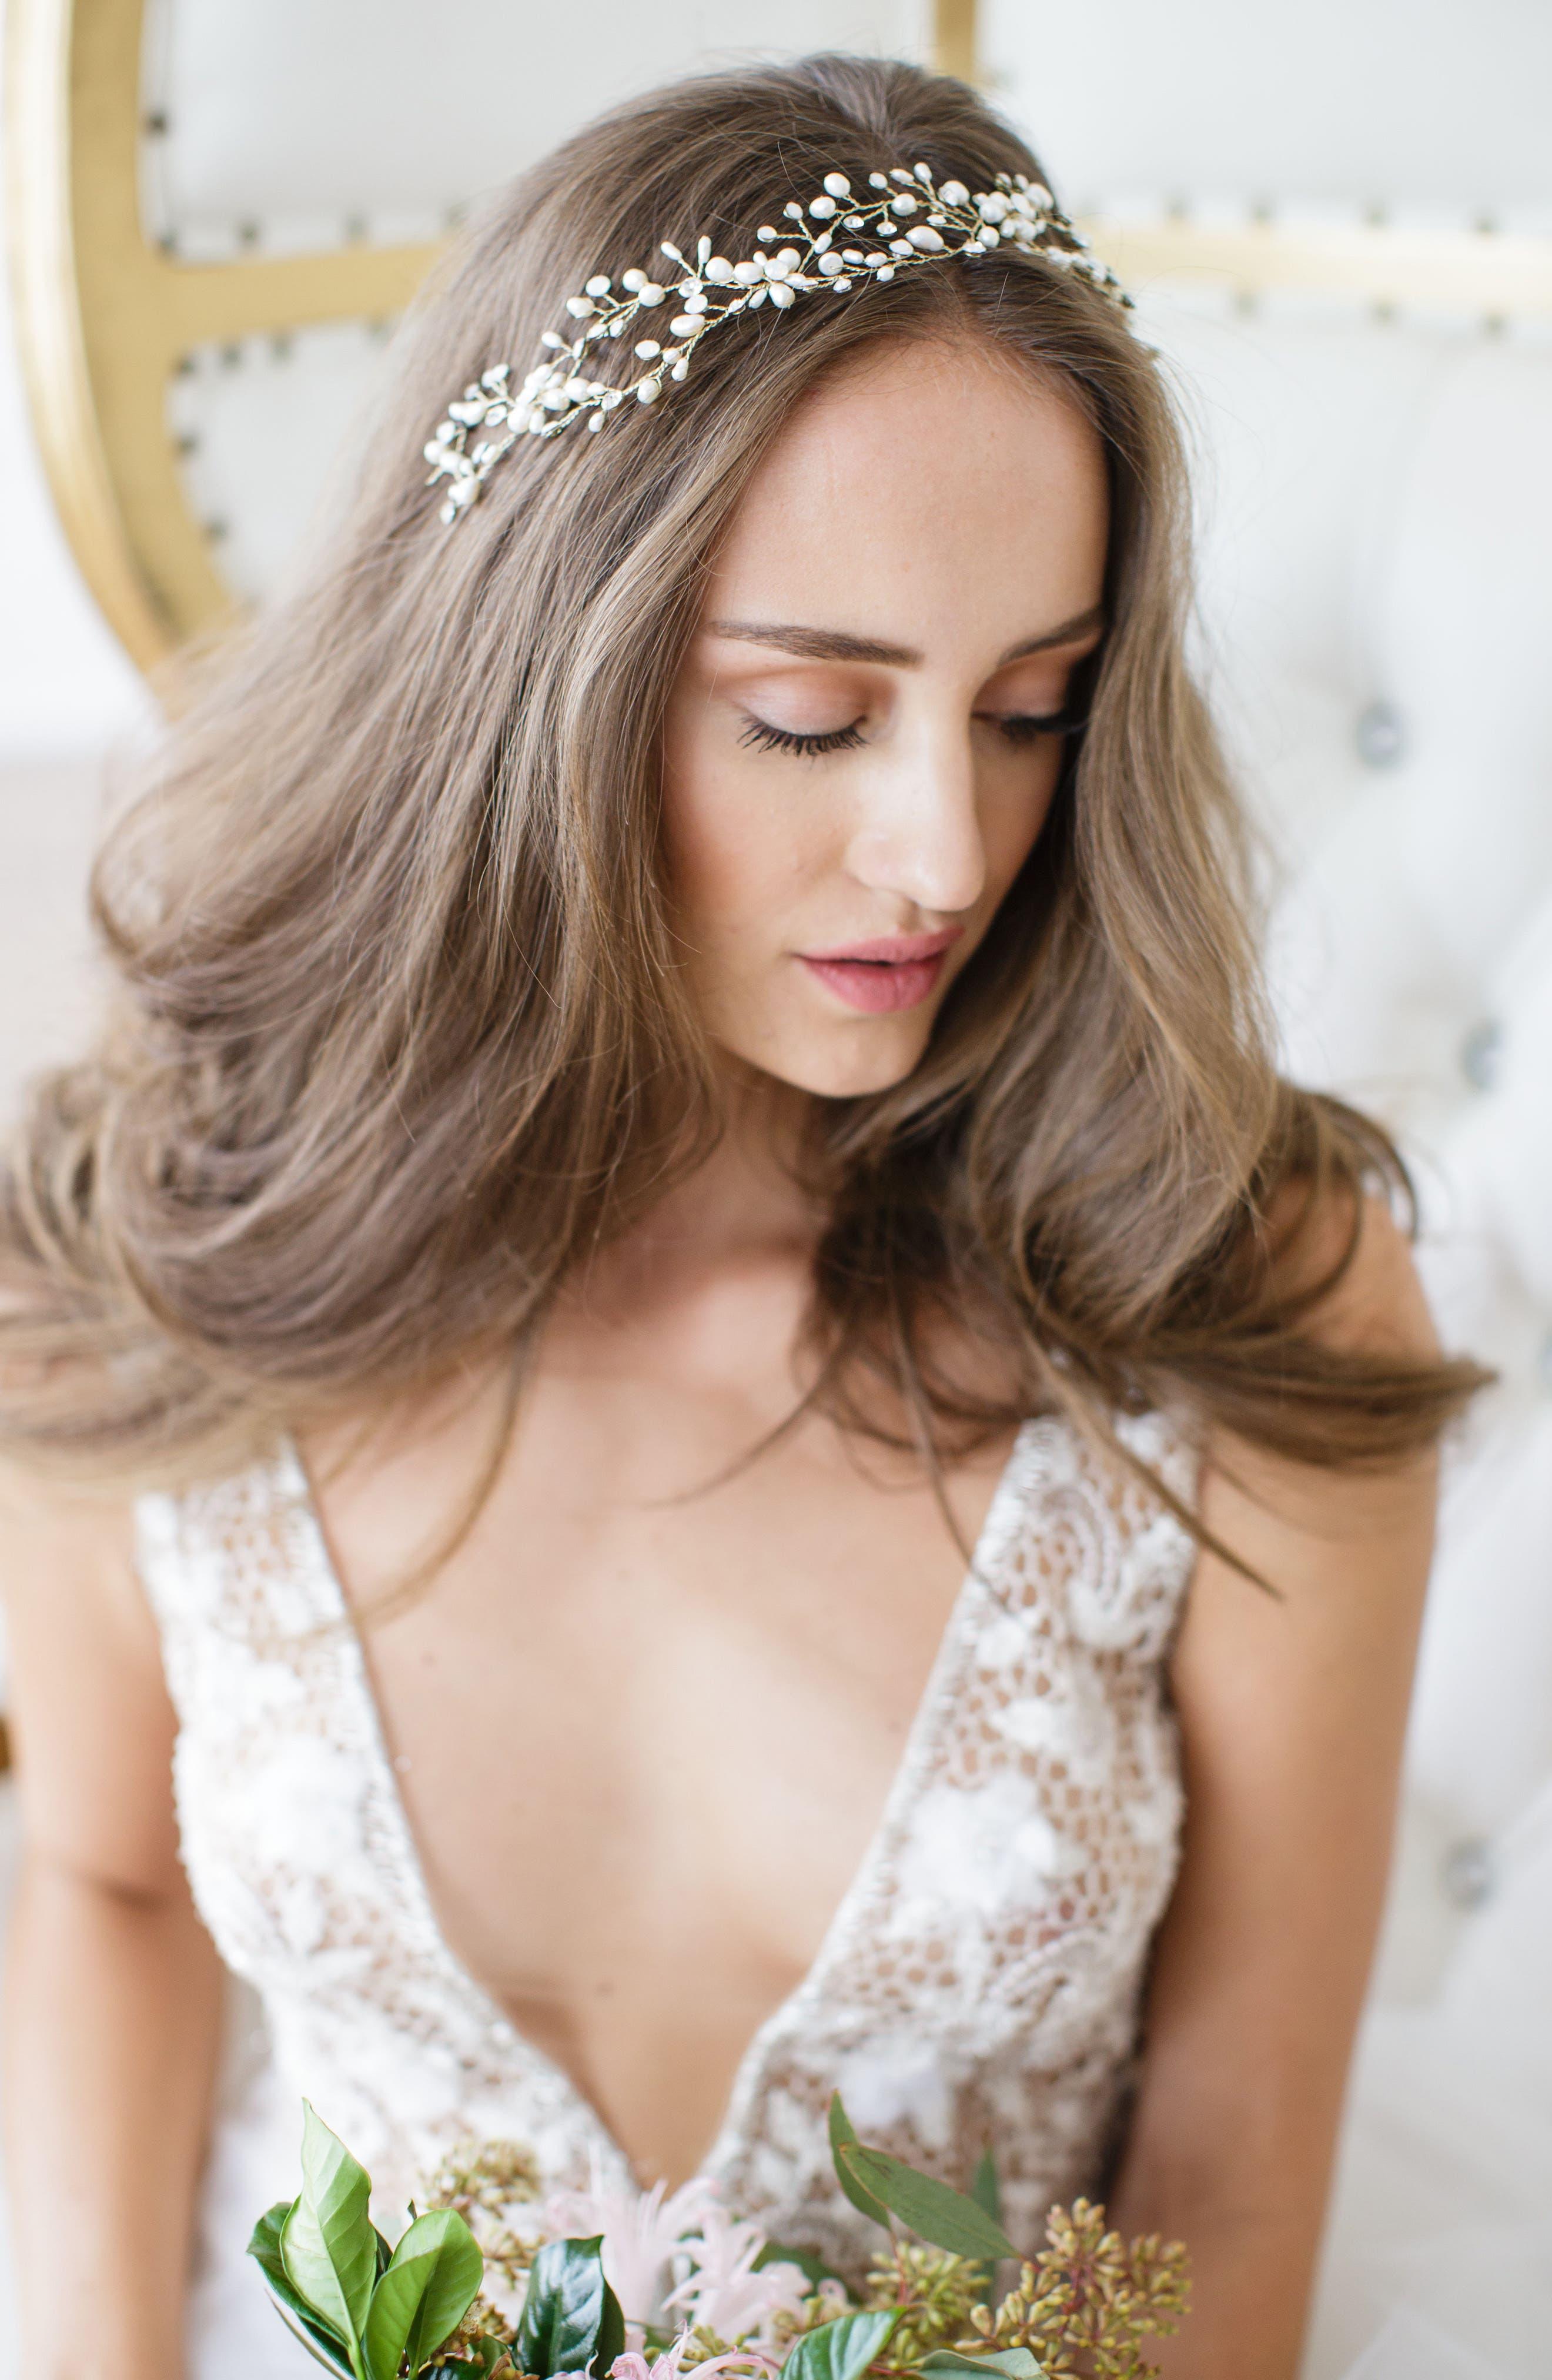 Alternate Image 1 Selected - Brides & Hairpins 'Arabella' Jeweled Halo & Sash